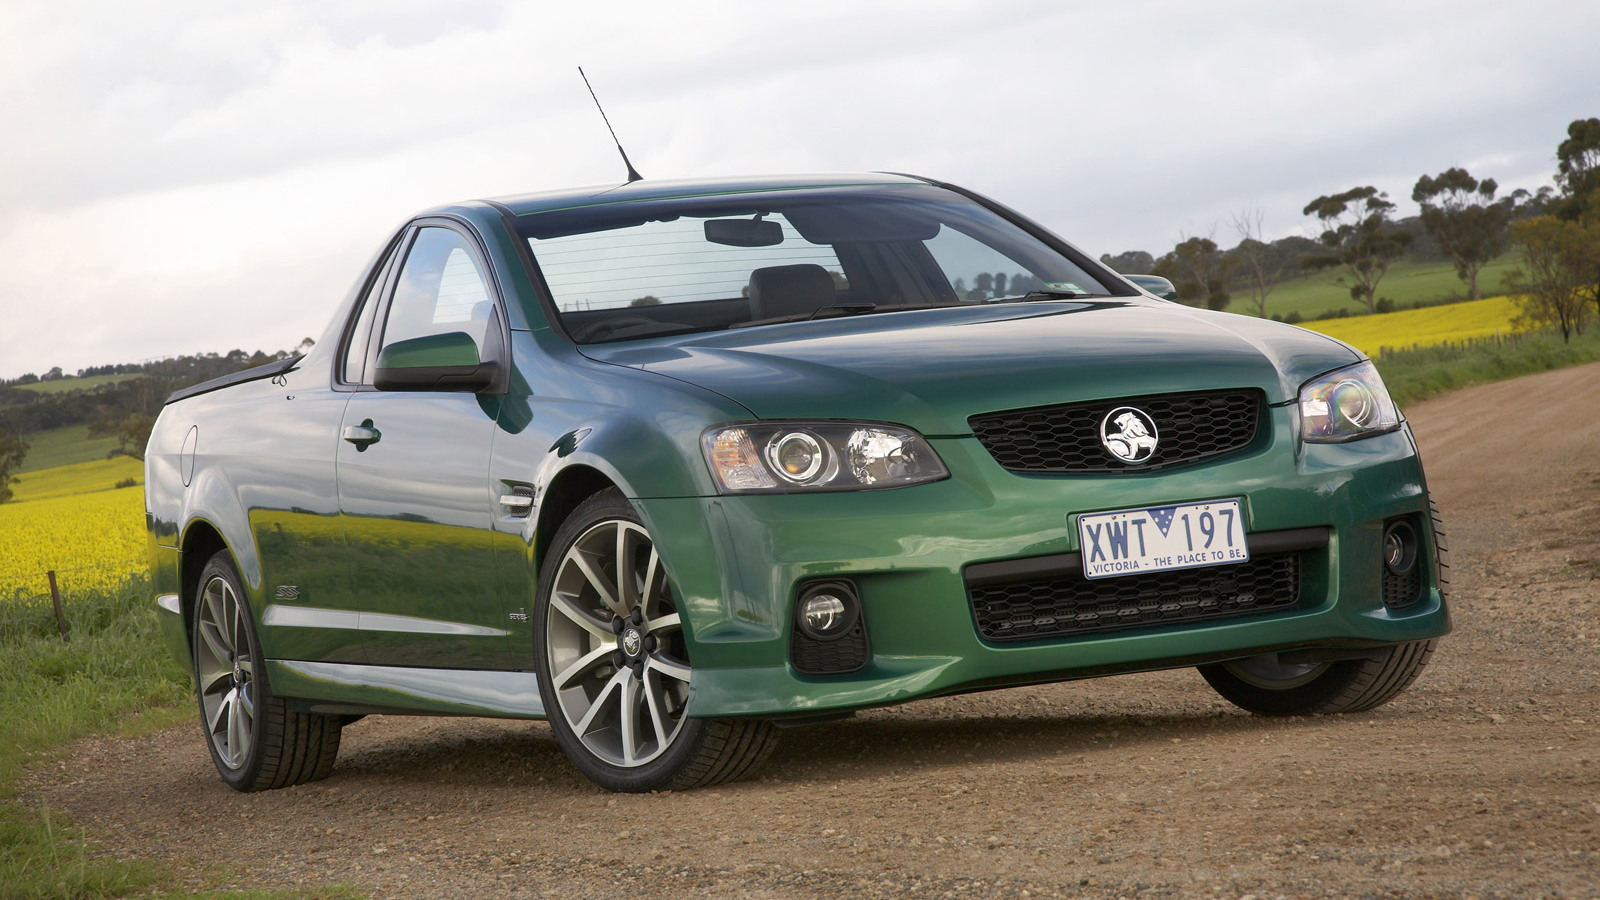 2011 Holden Commodore Ute